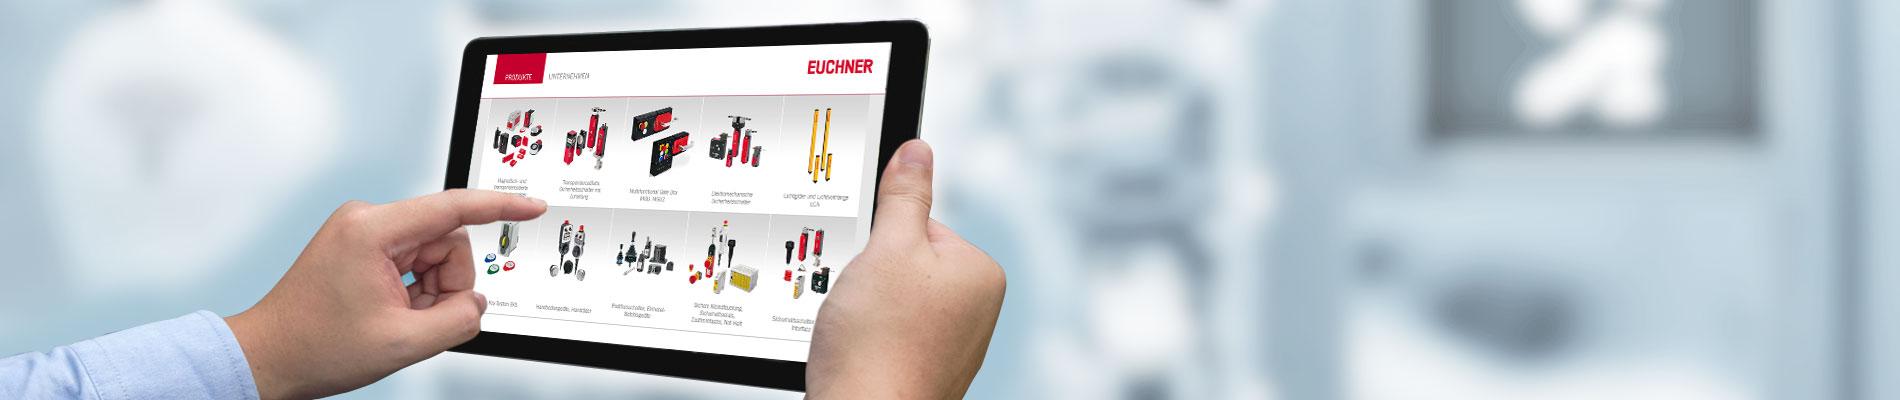 EKS USB ドライバー、デモおよびテスト ソフトウェア